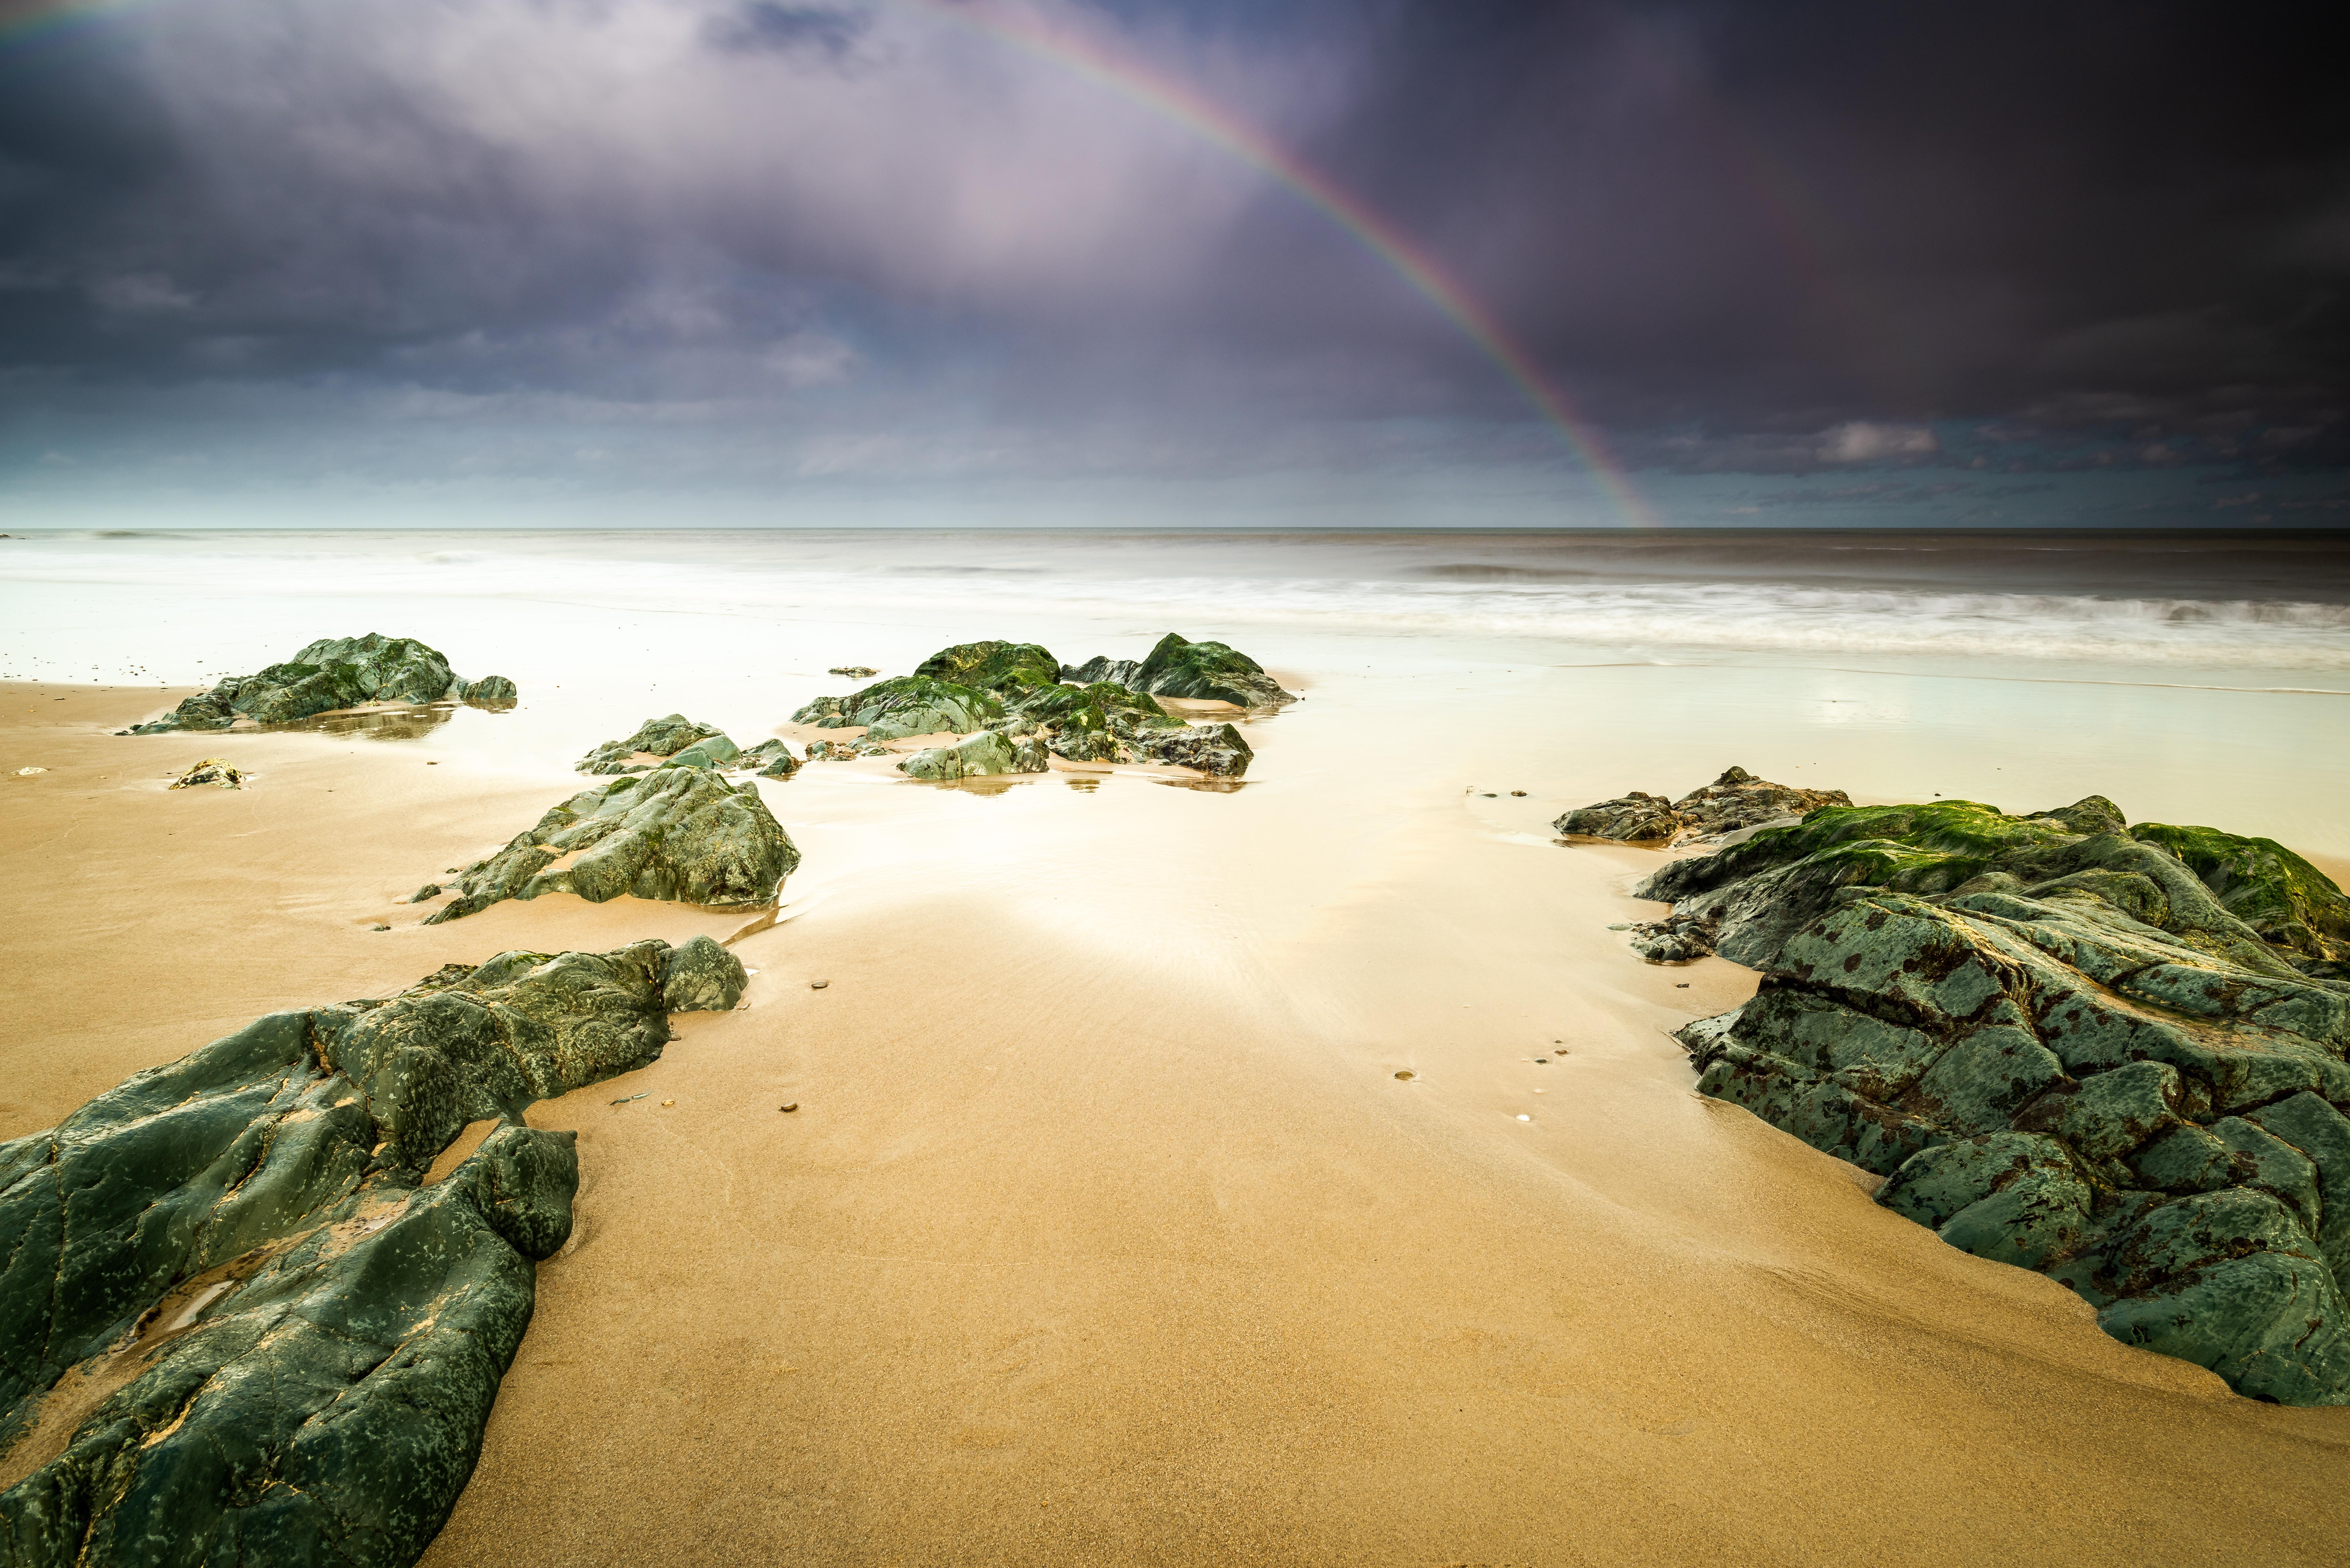 Rainbow Cahore Beach Ireland Wexford Rocks